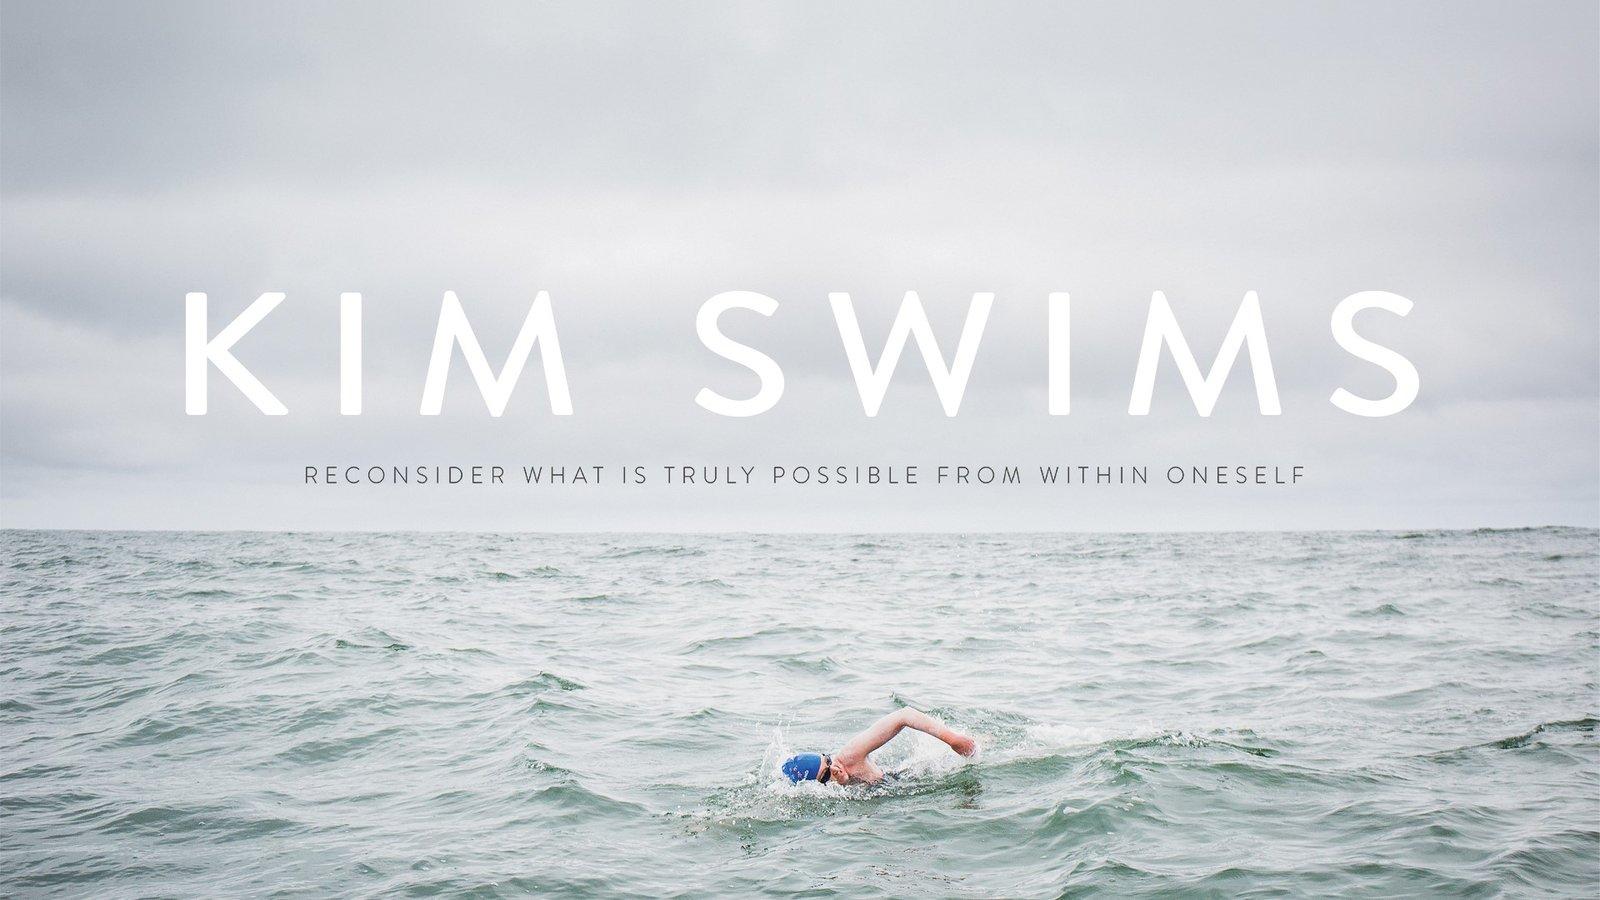 Kim Swims - A Record-Breaking Female Athlete